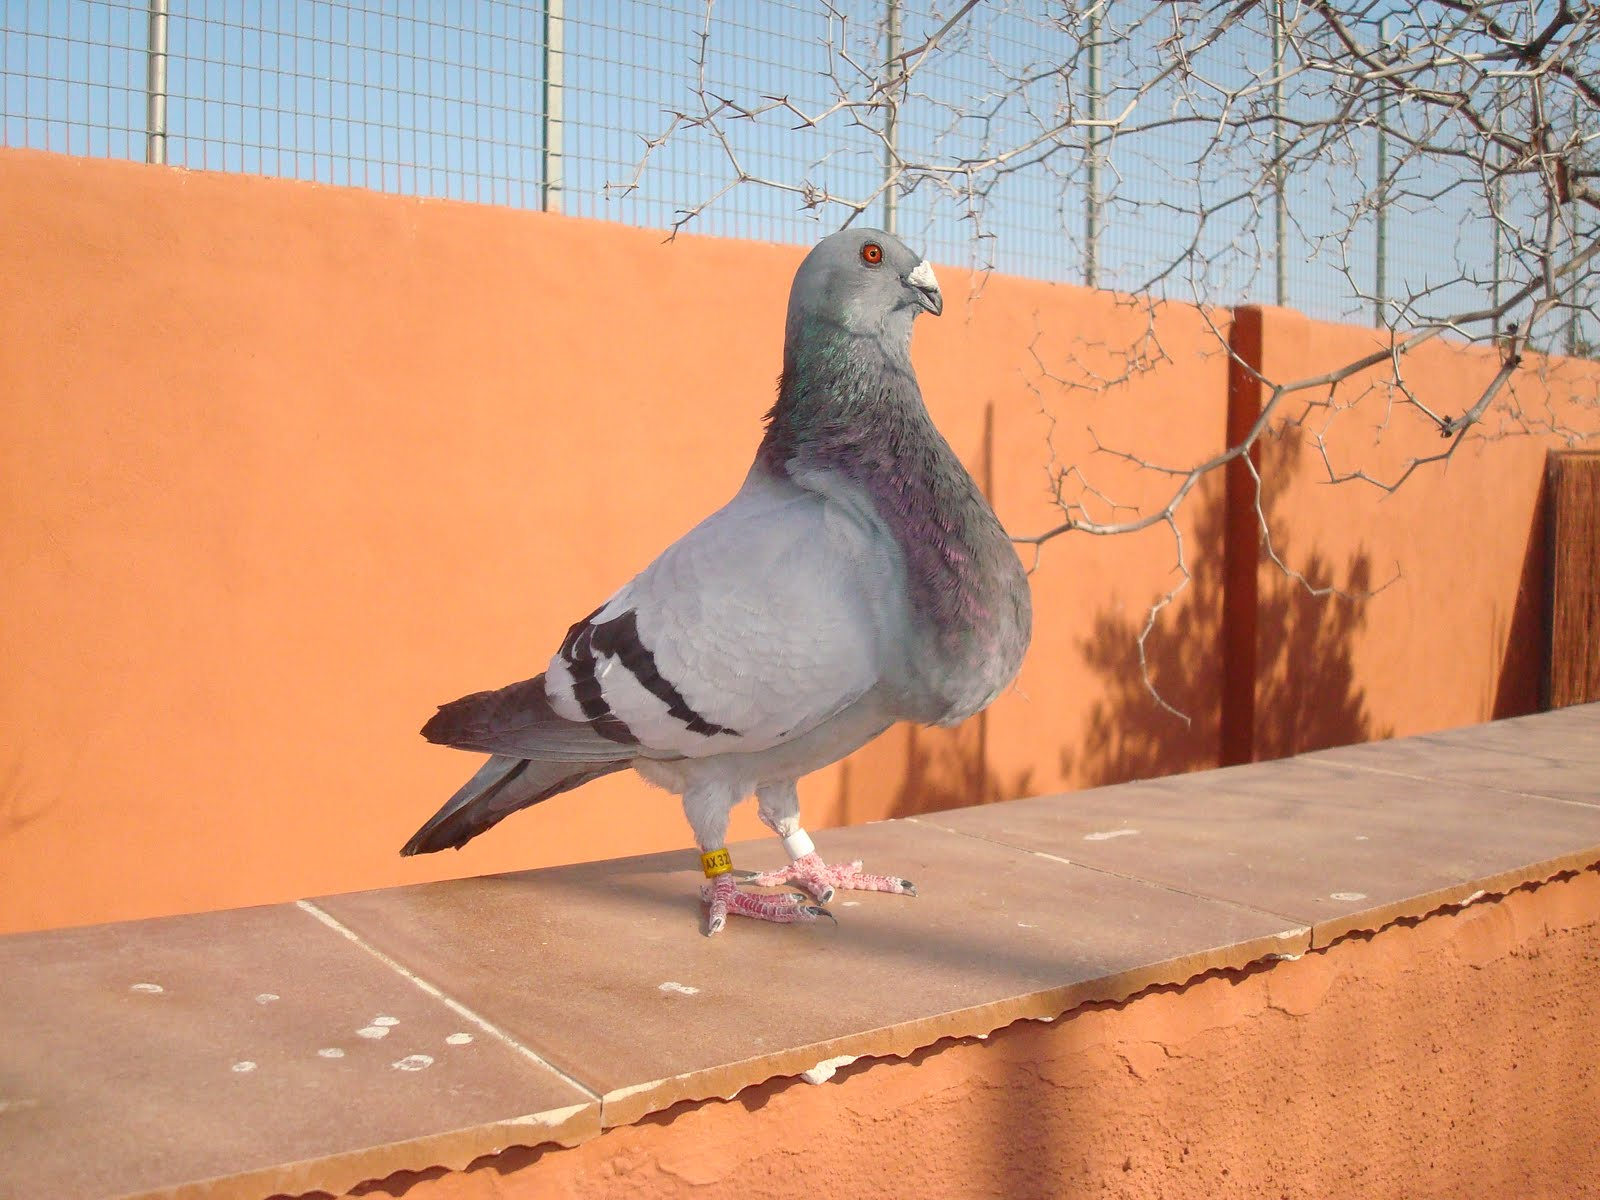 encontrar hembra voyeur cerca de Granada